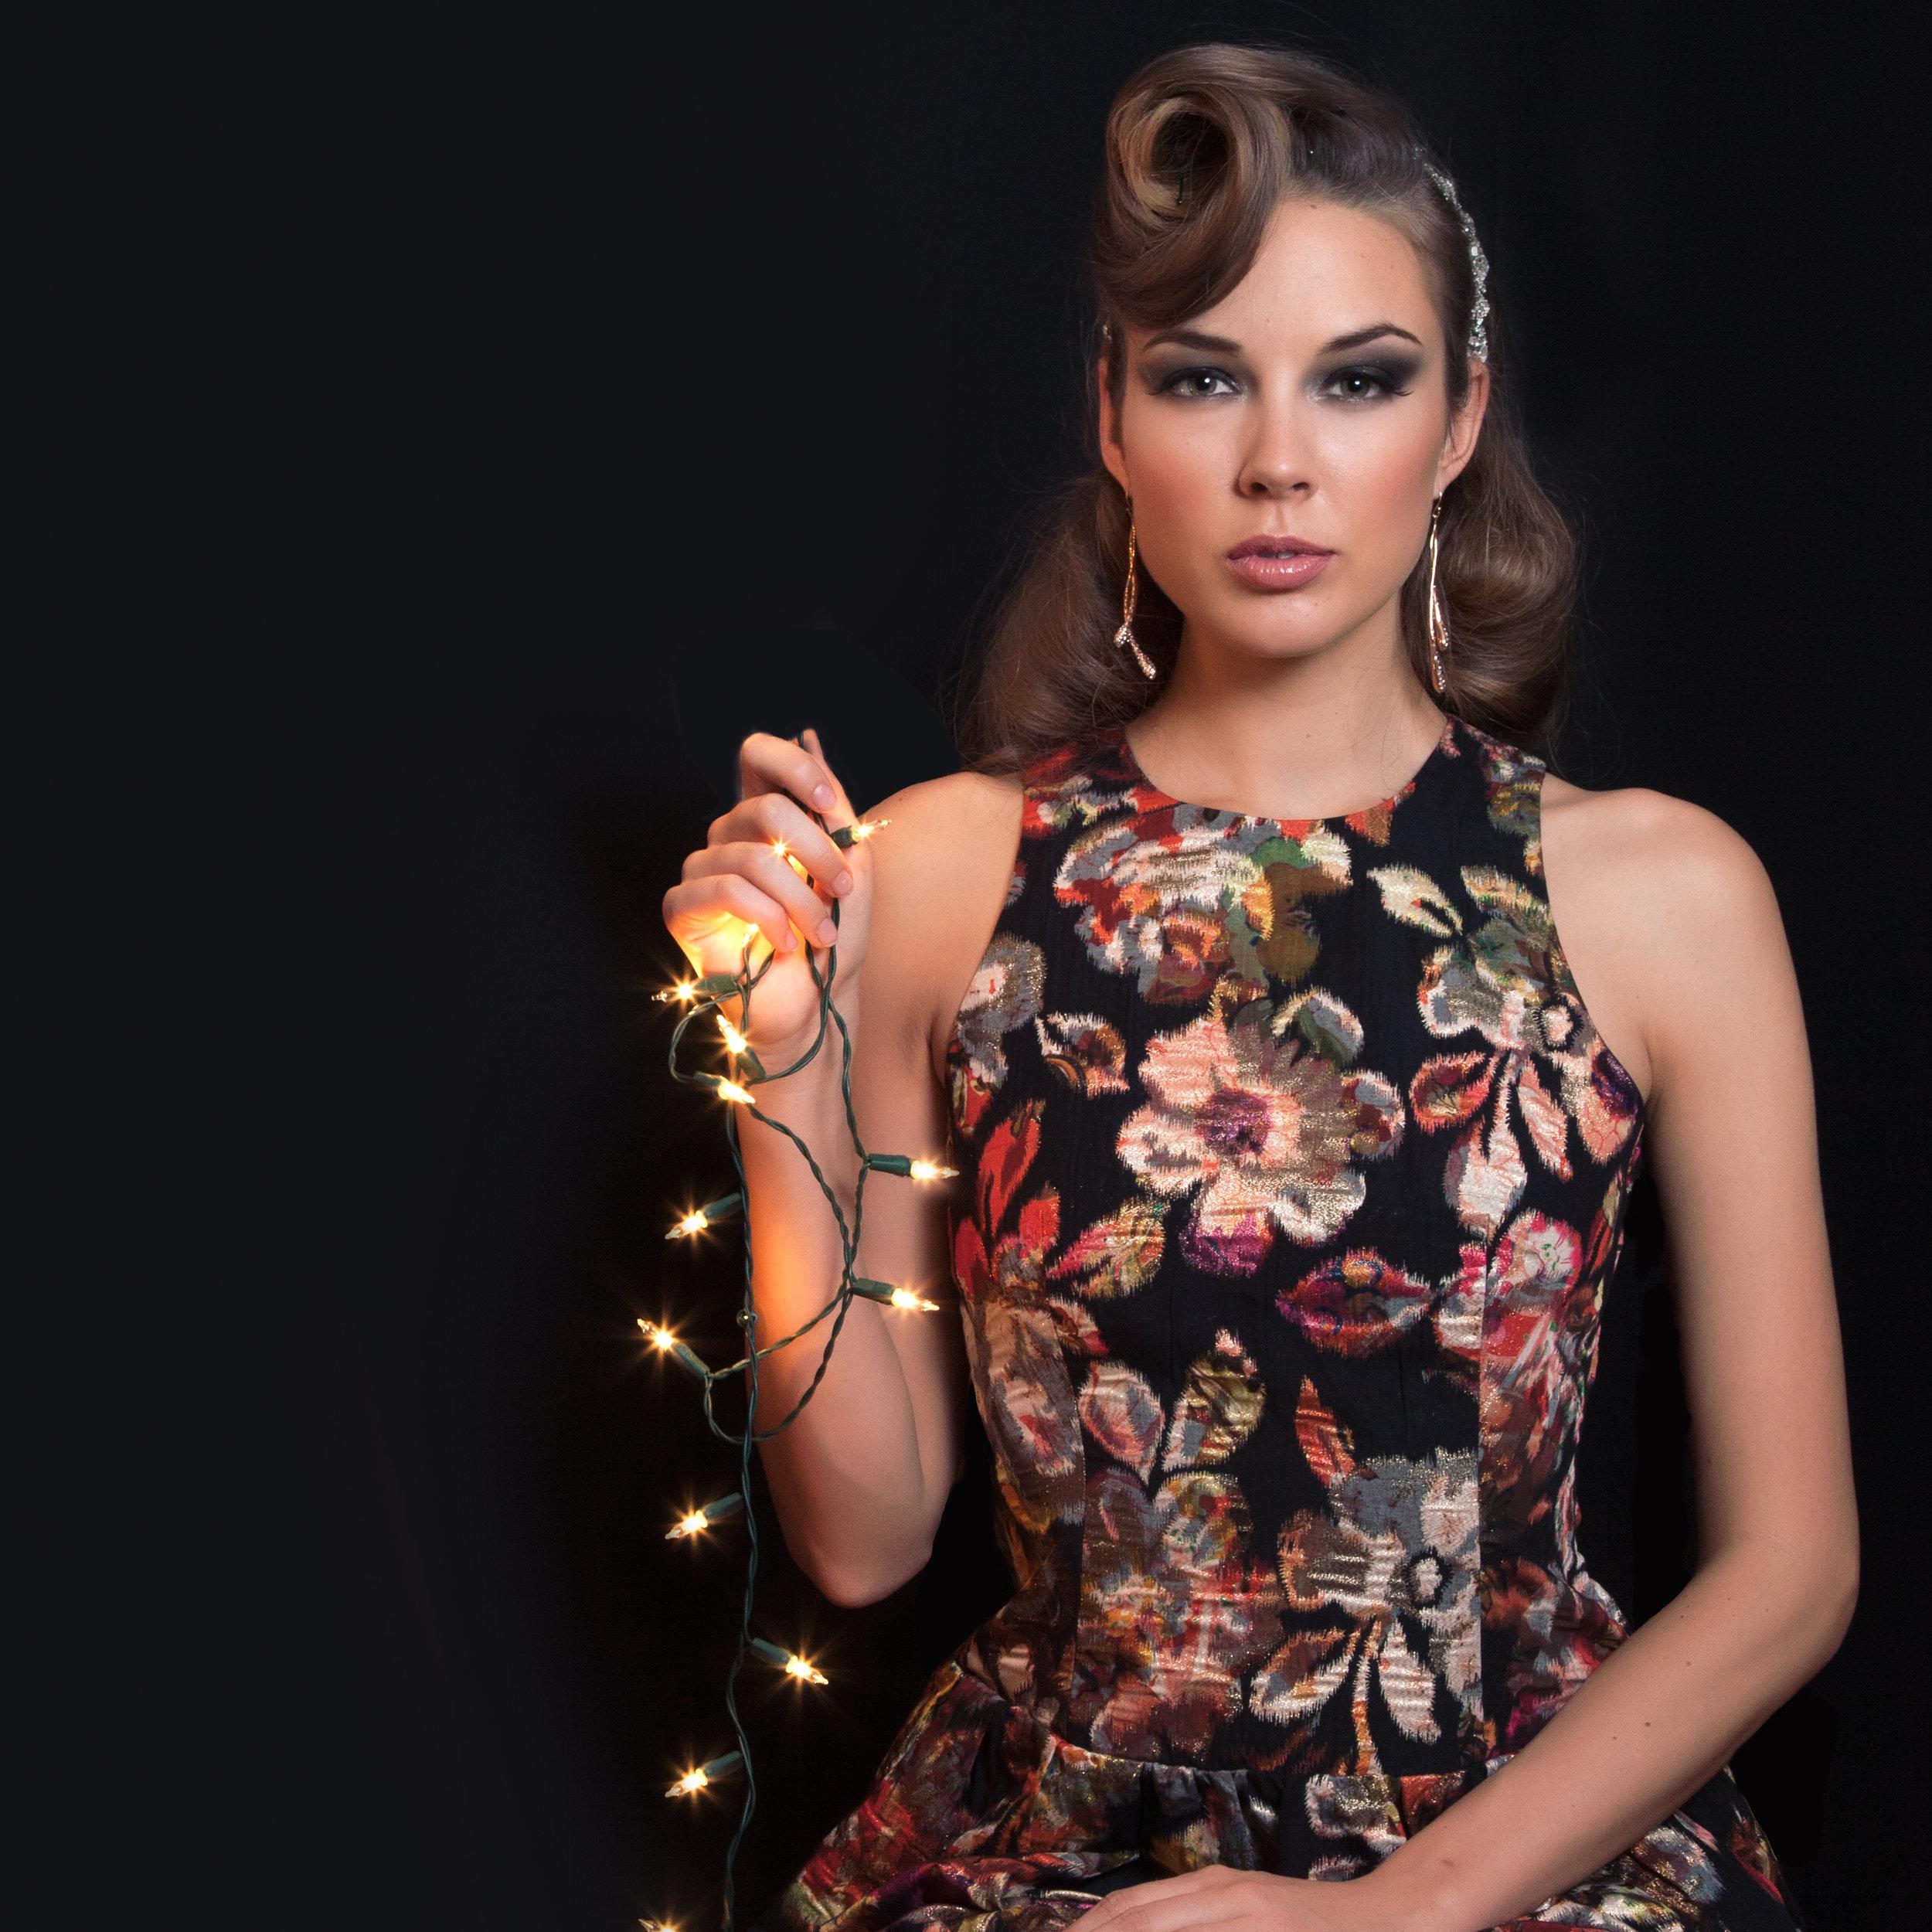 Shana-Schnur-Photography-Fashion-Beauty-New-York-City.jpg